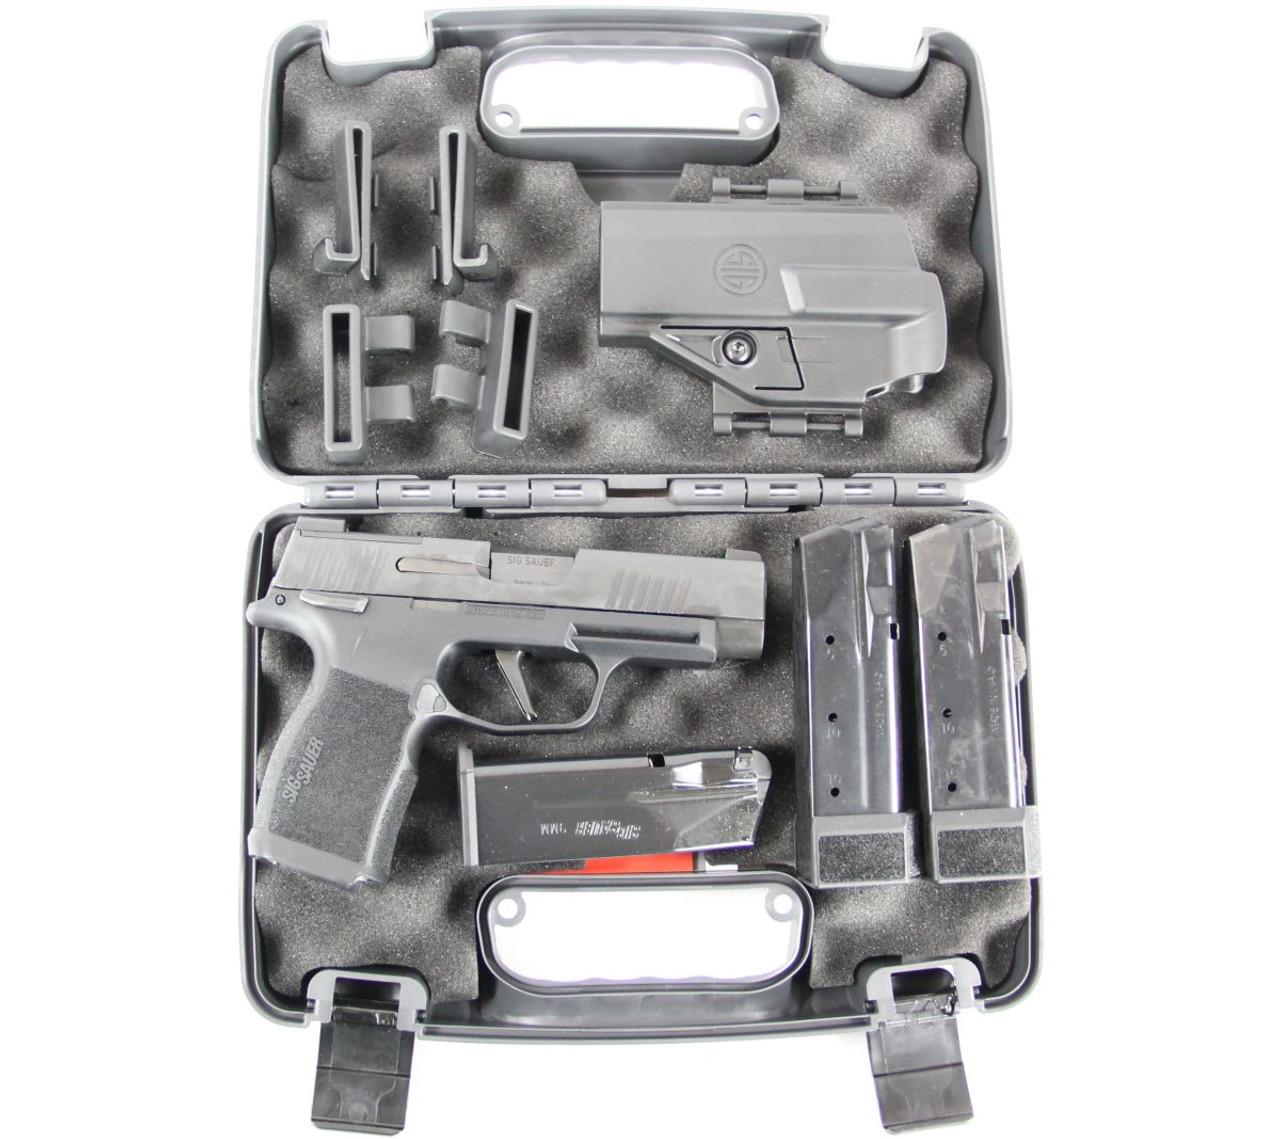 Sig Sauer P365XL Tac Pac - 365XL-9-BXR3-MS-TACPAC - Sig 365 for sale!   Xray3 sights